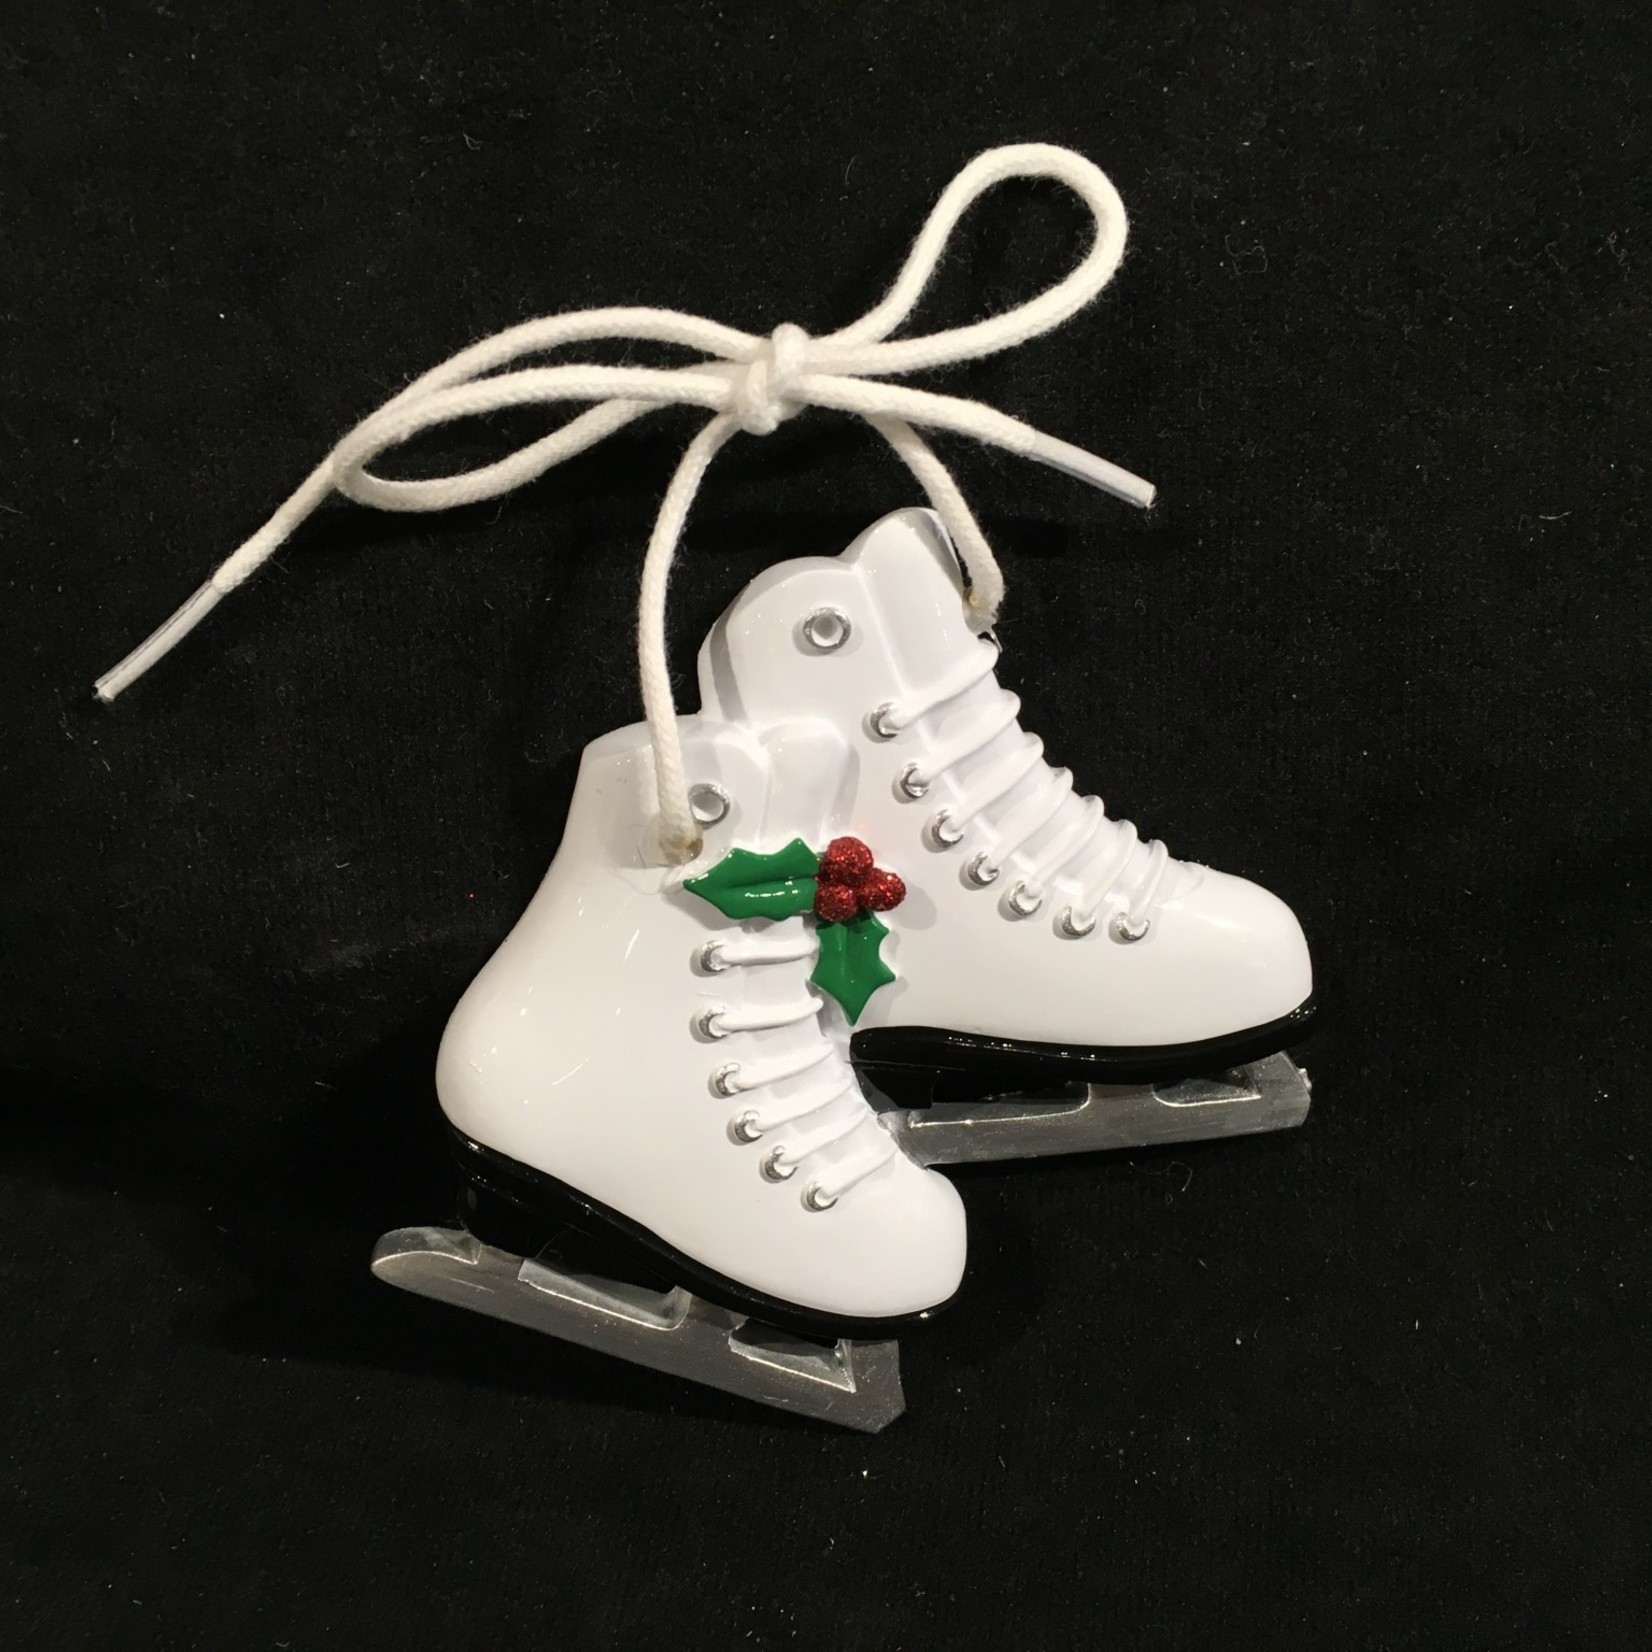 Personalized Figure Skates Orn